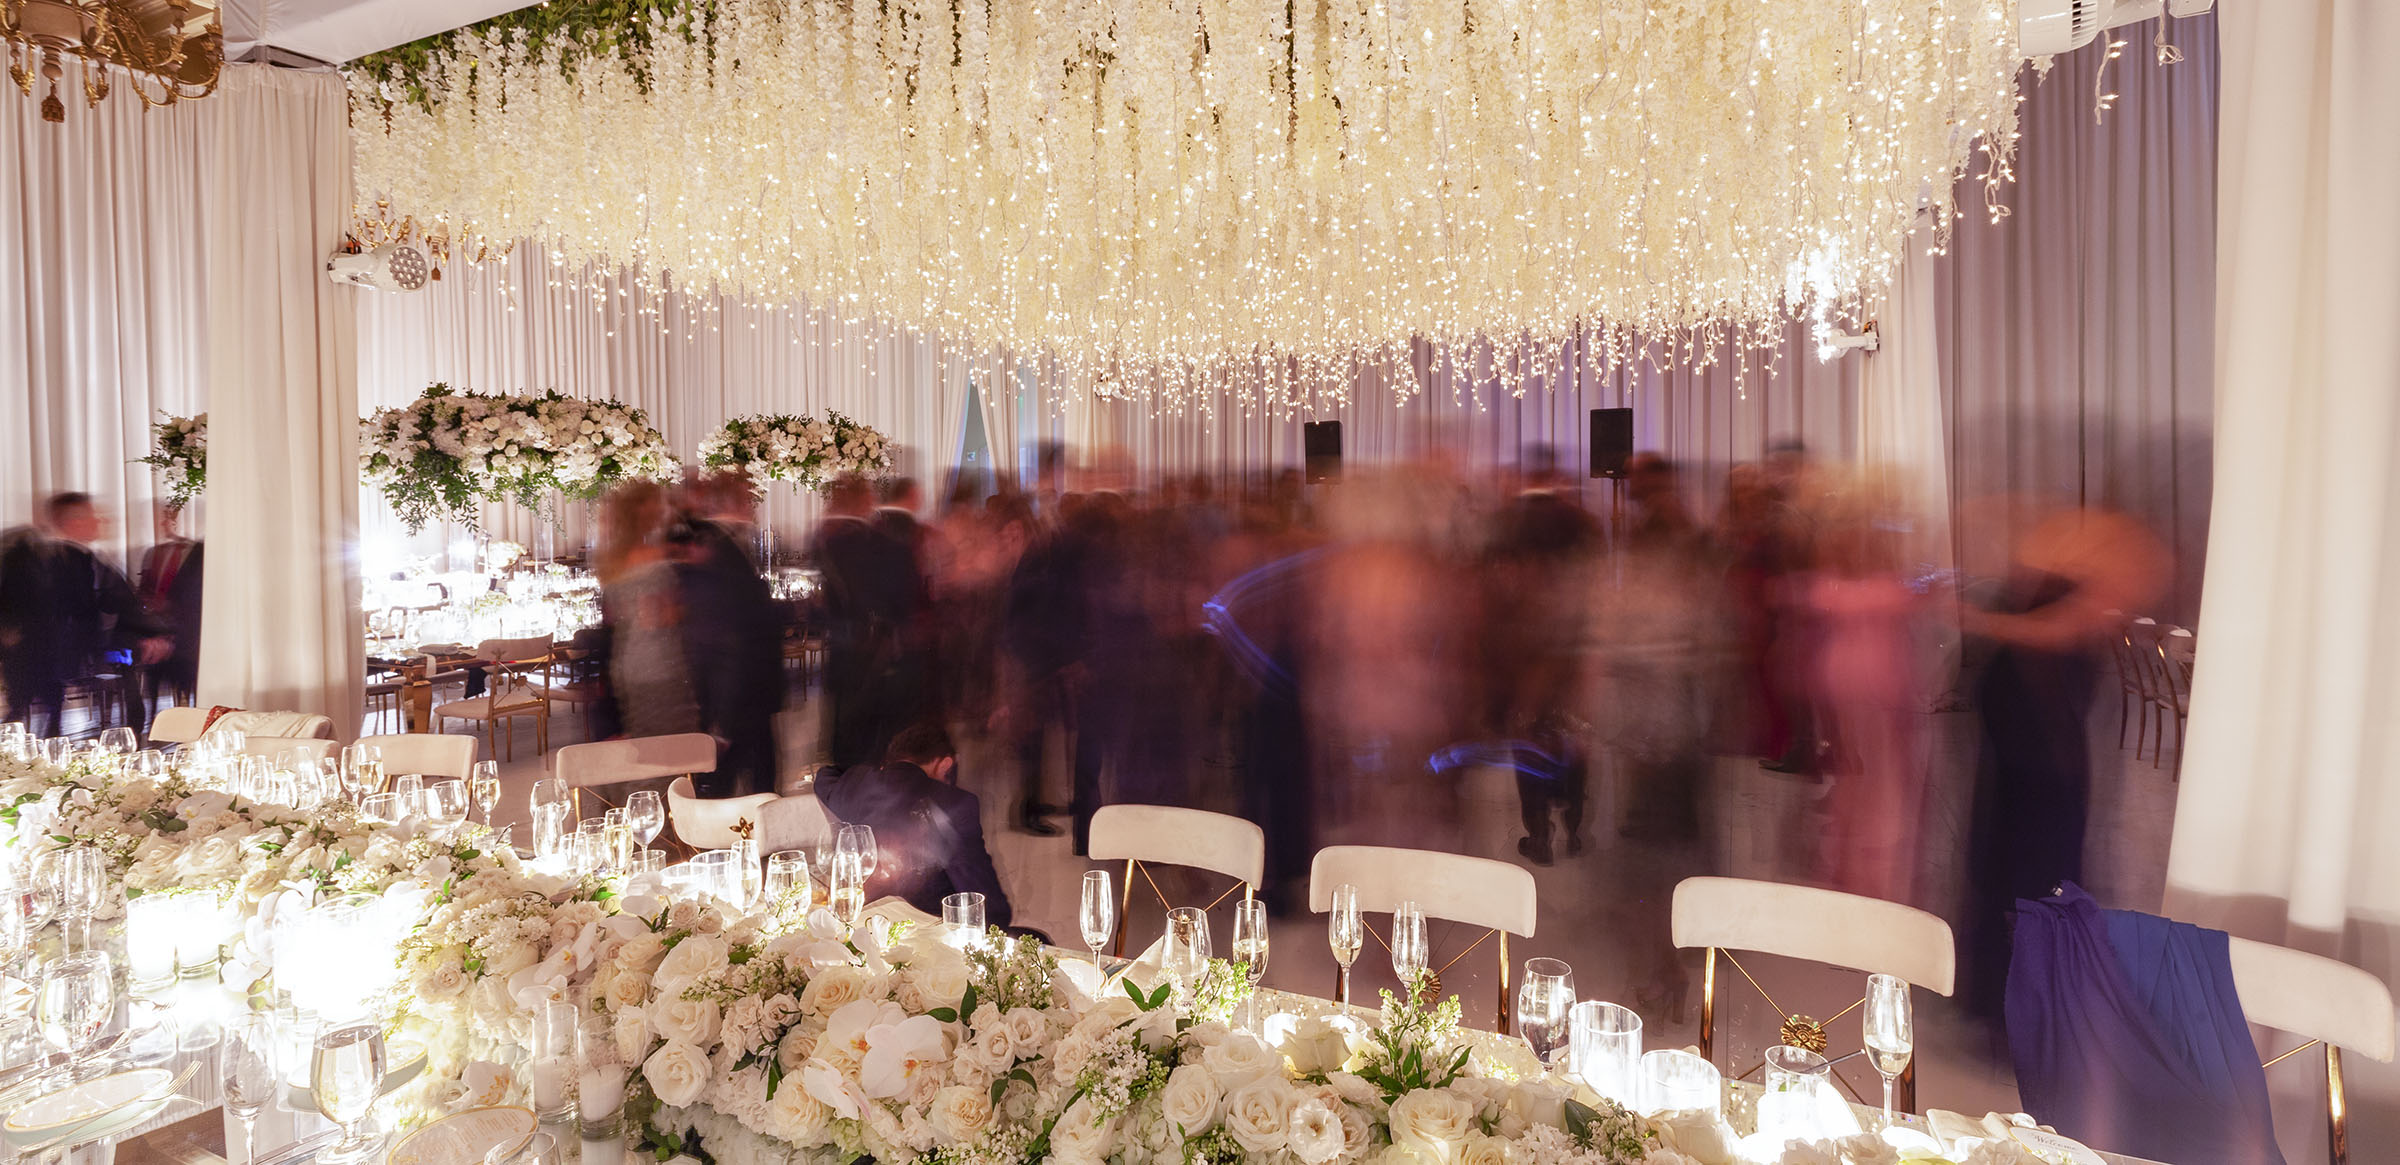 maria-eduardo-montage-beverly-hills-wedding-255w.jpg